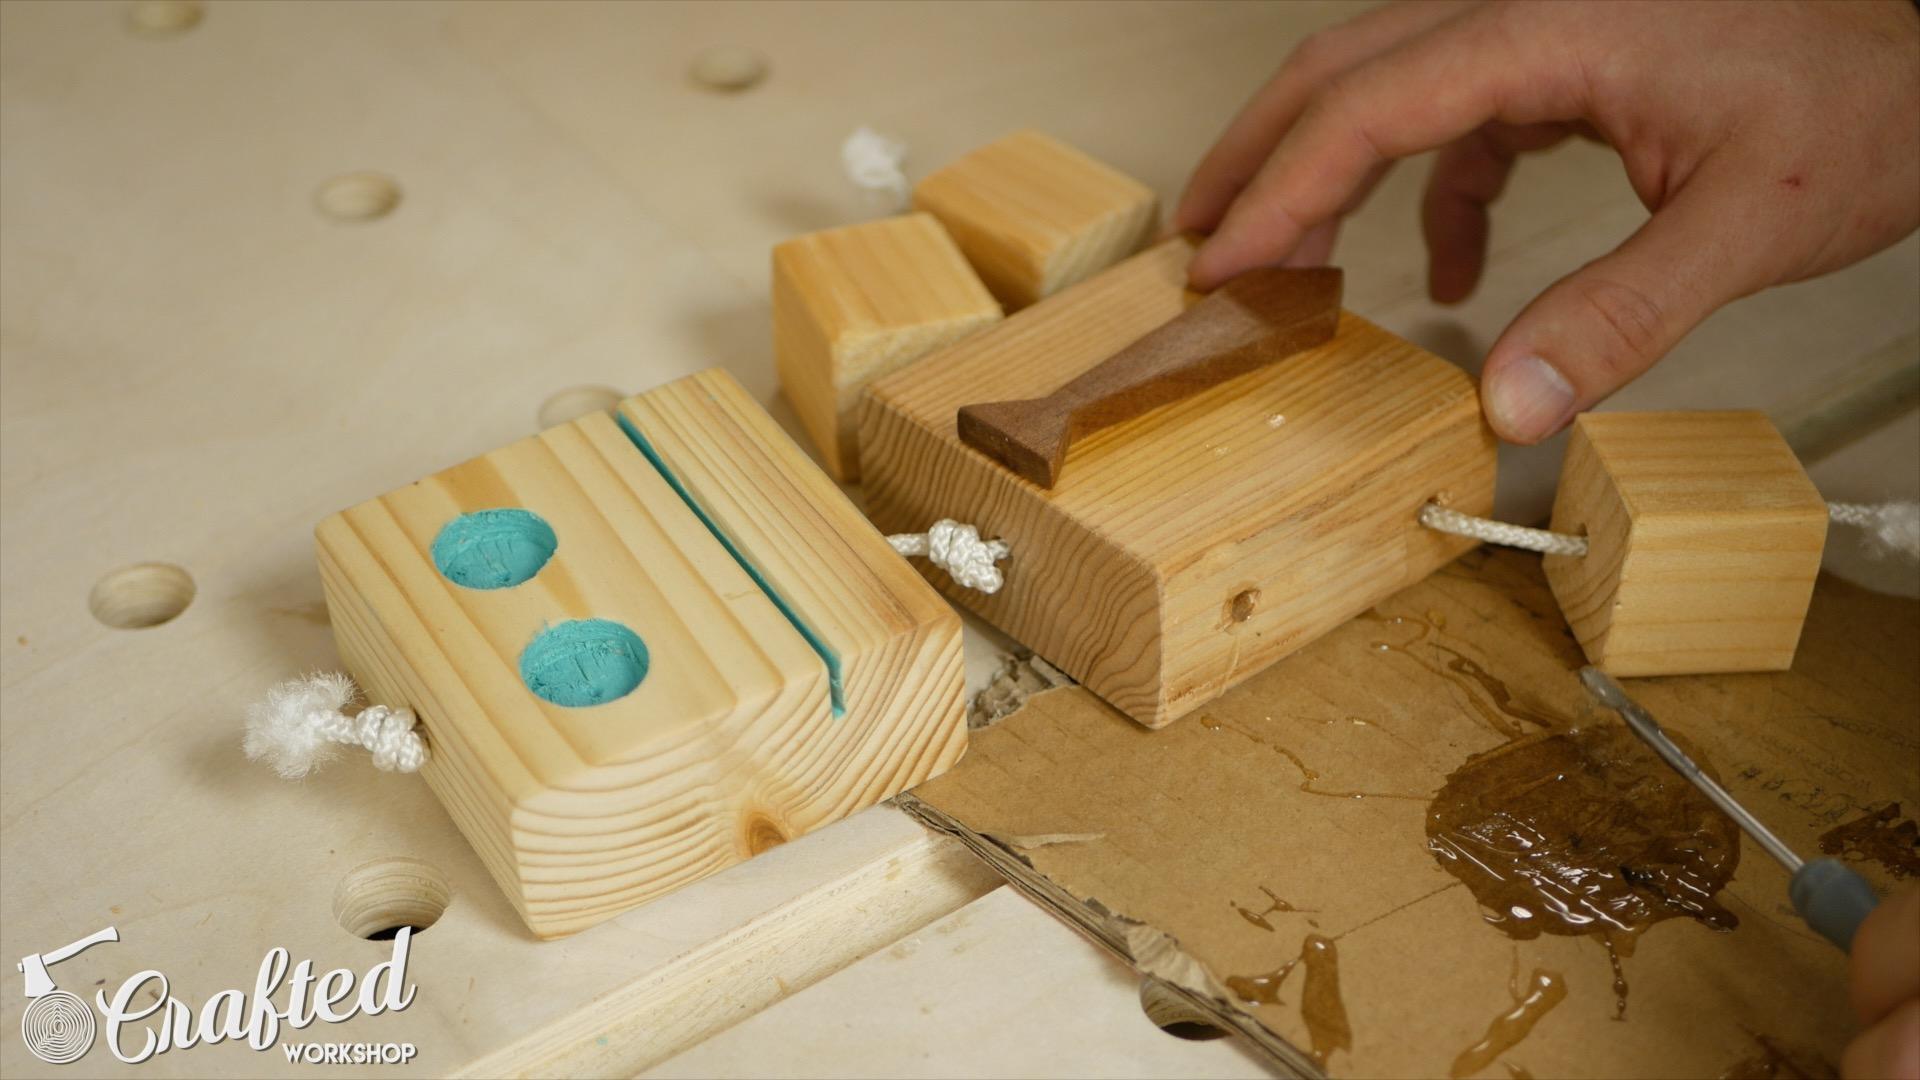 wooden-toy-robot-homemade-diy-12